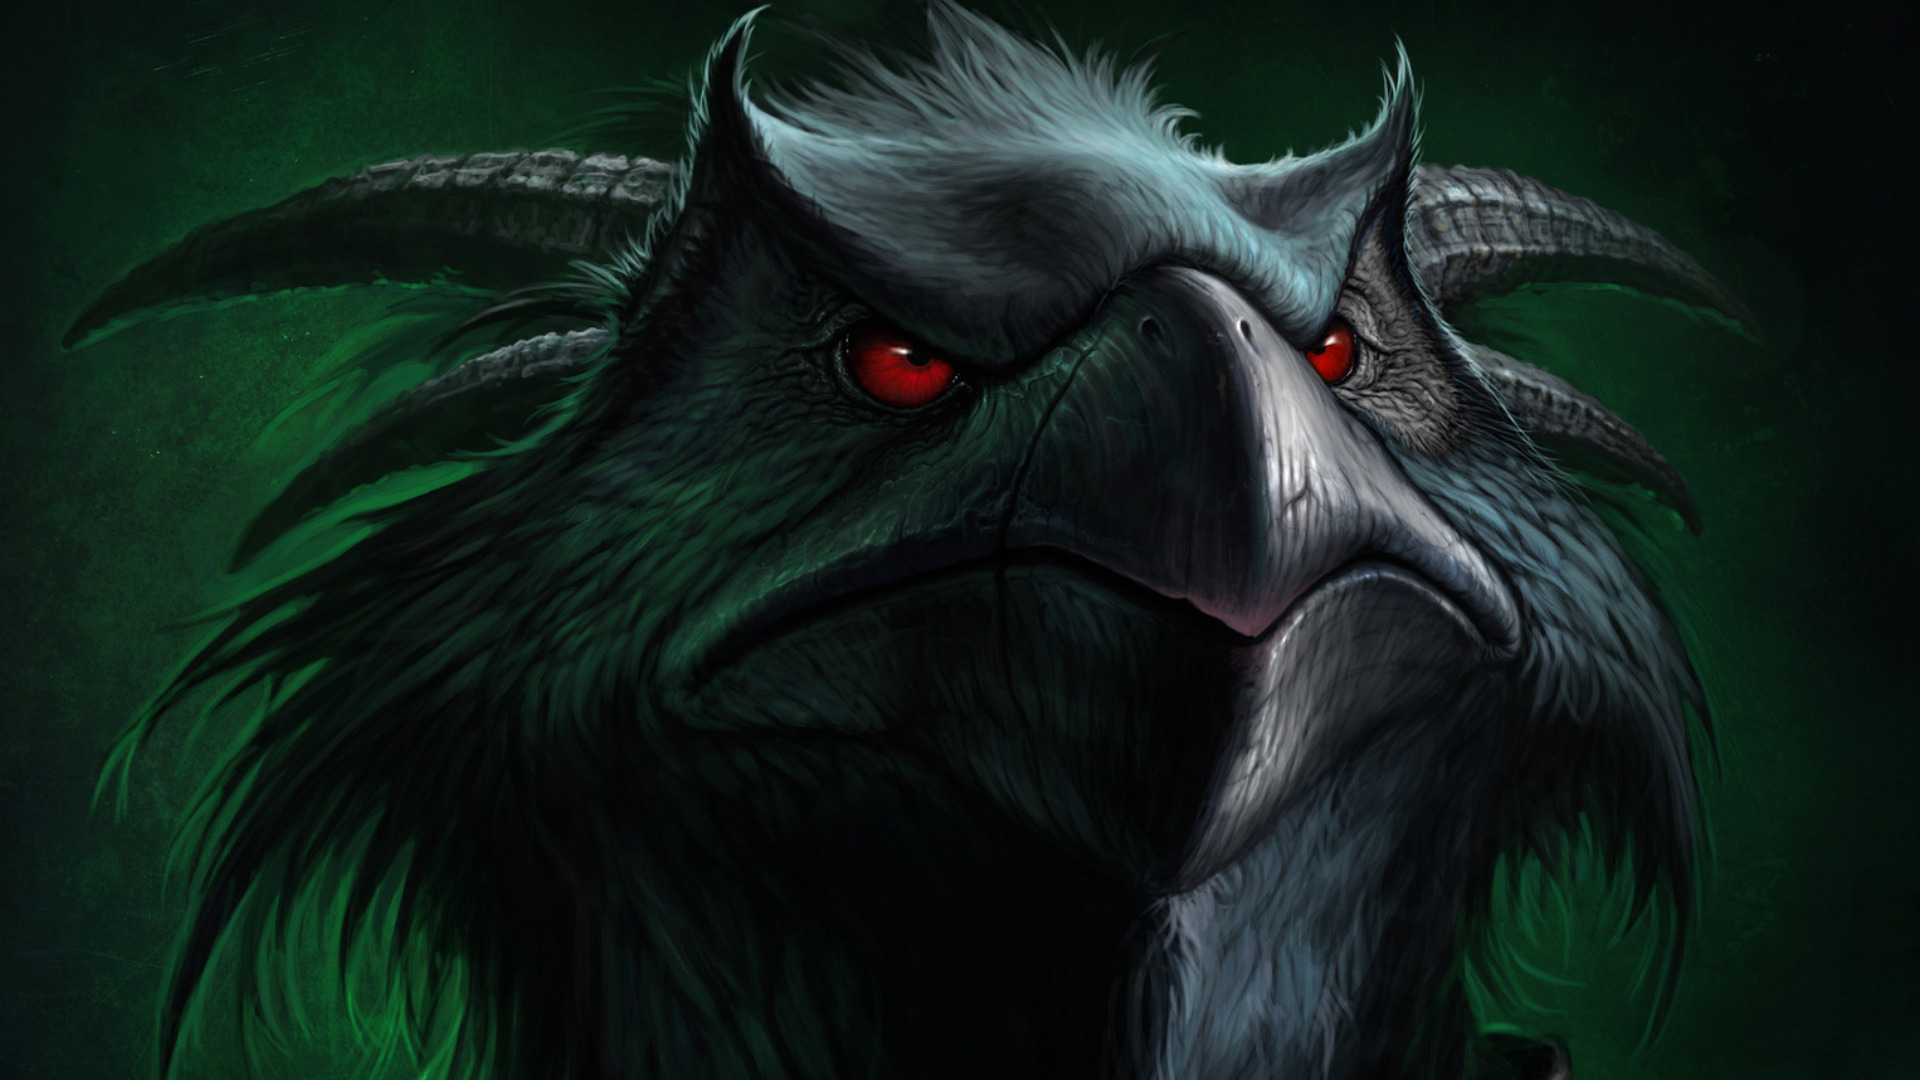 Mythical creatures wallpaper Full HD desktop